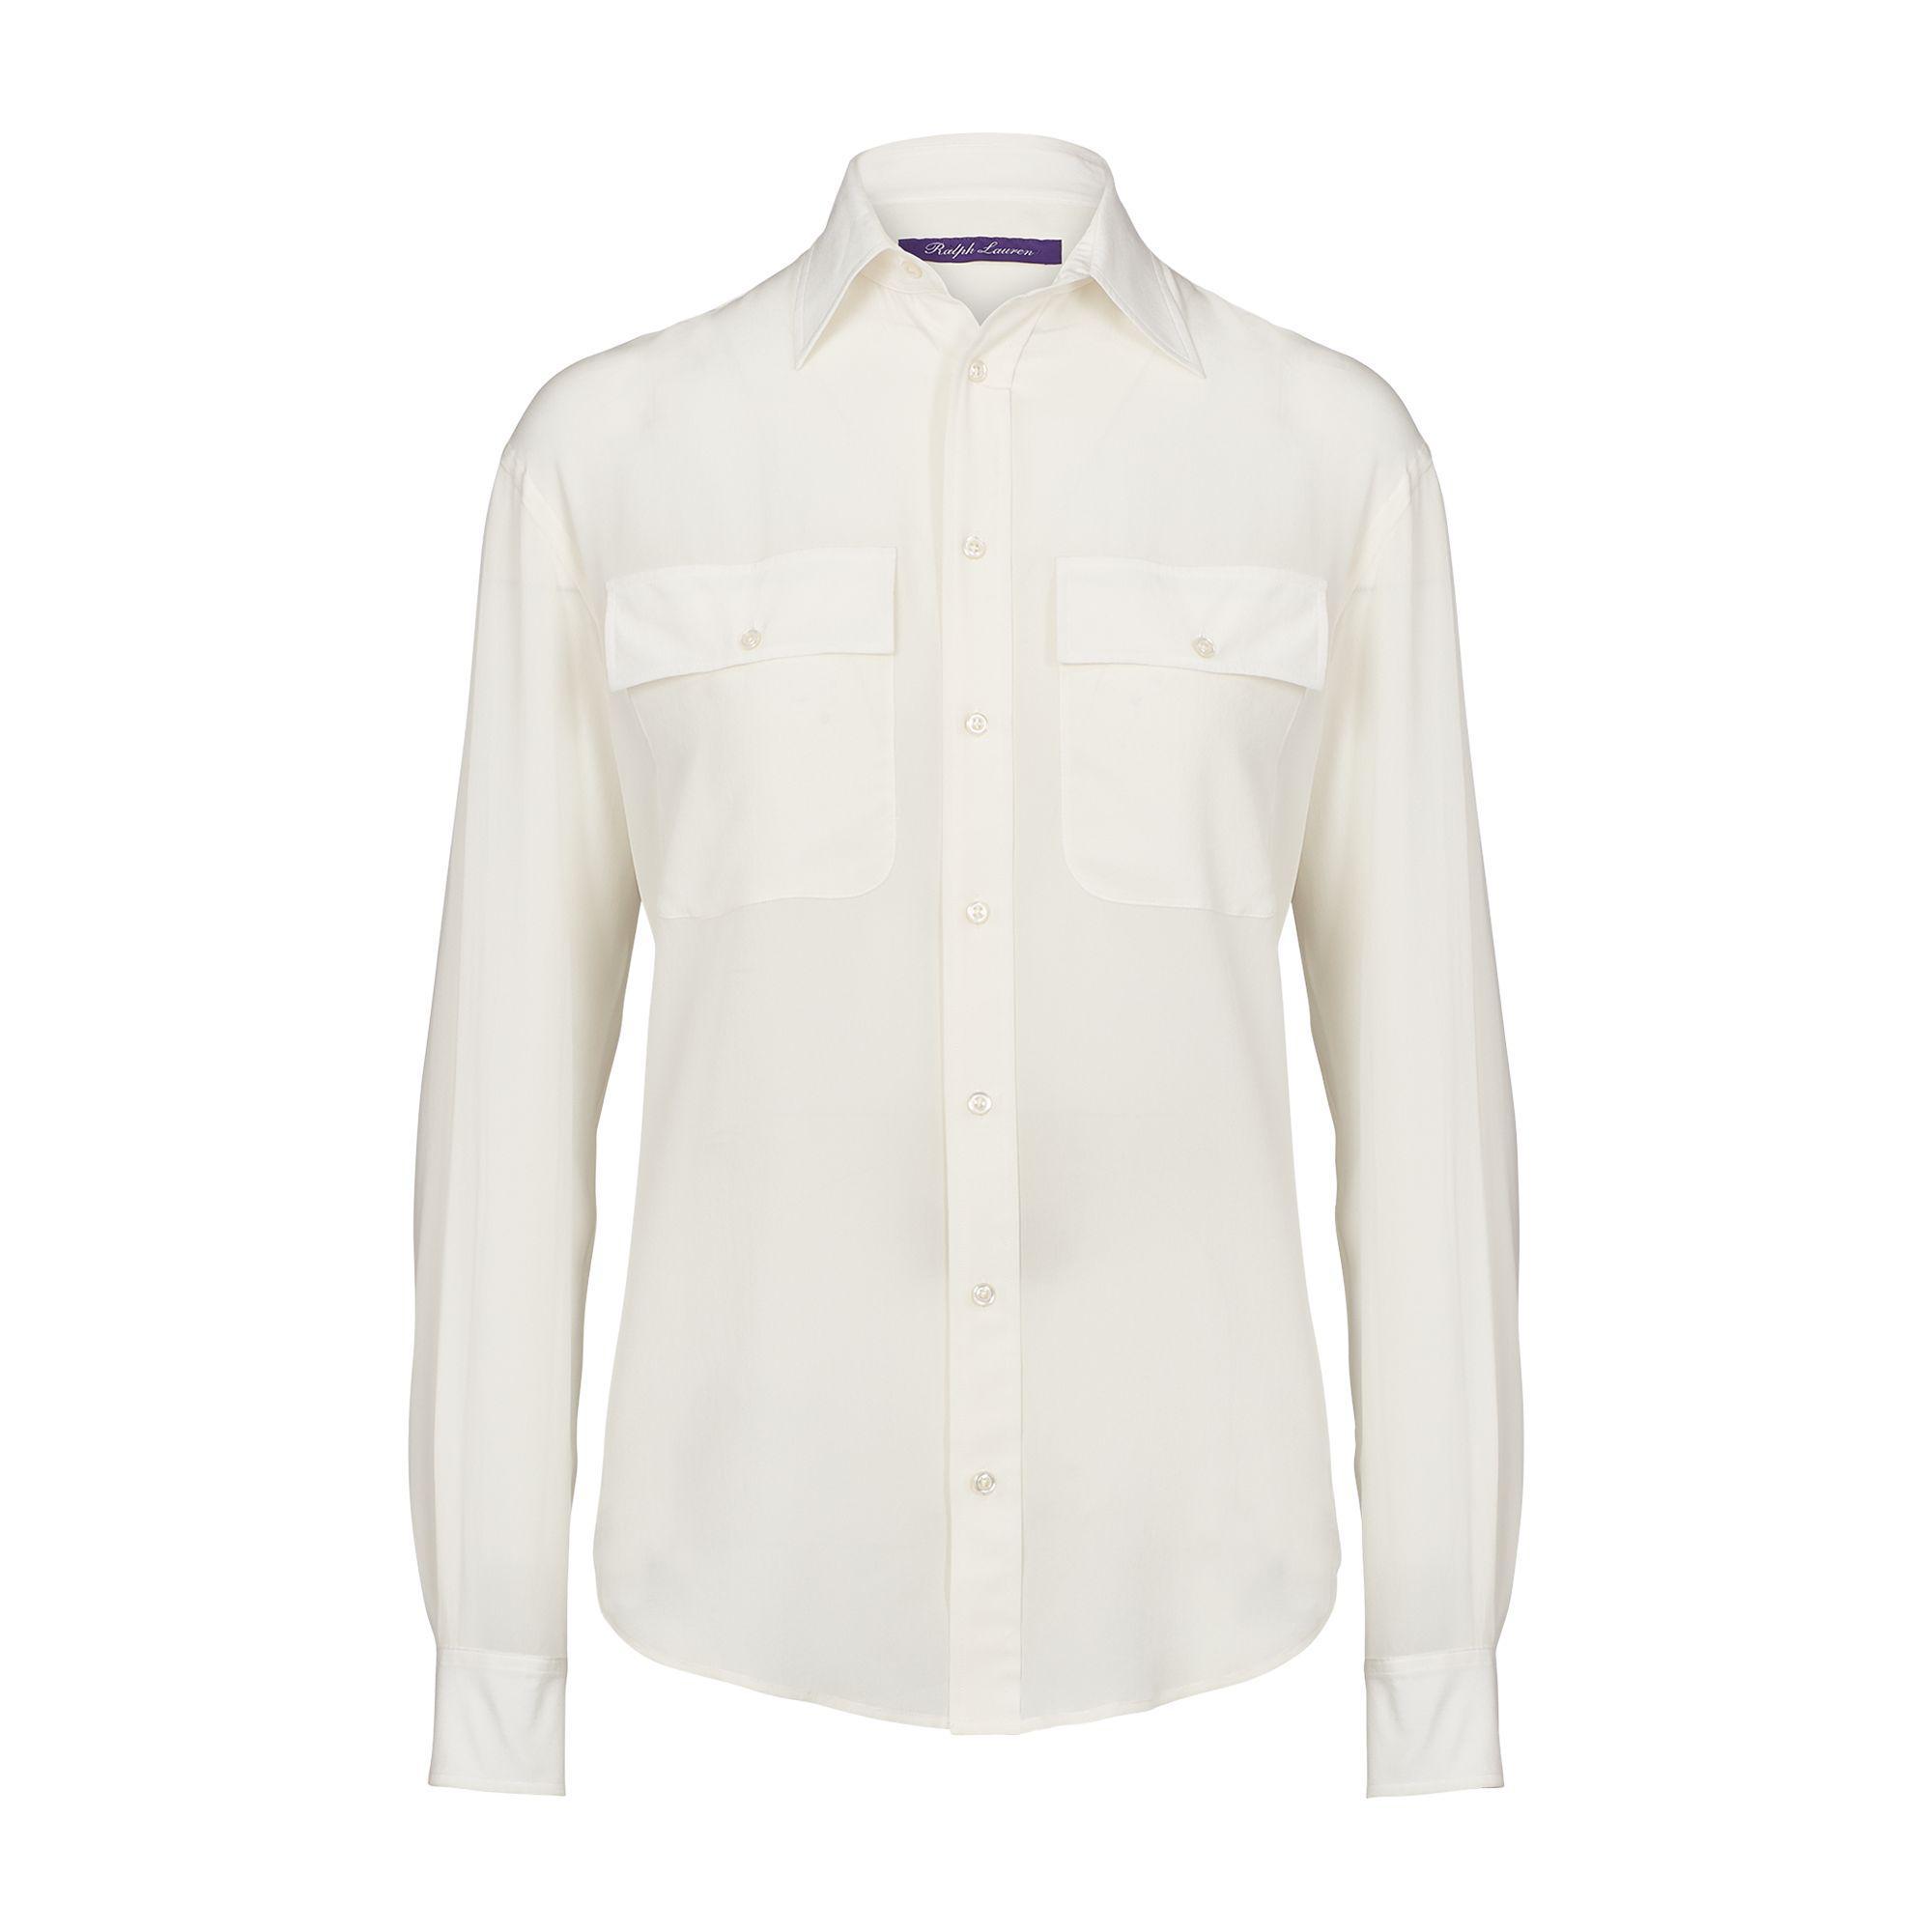 947c67335527aa Ralph Lauren - White Antoinette Silk Shirt - Lyst. View fullscreen